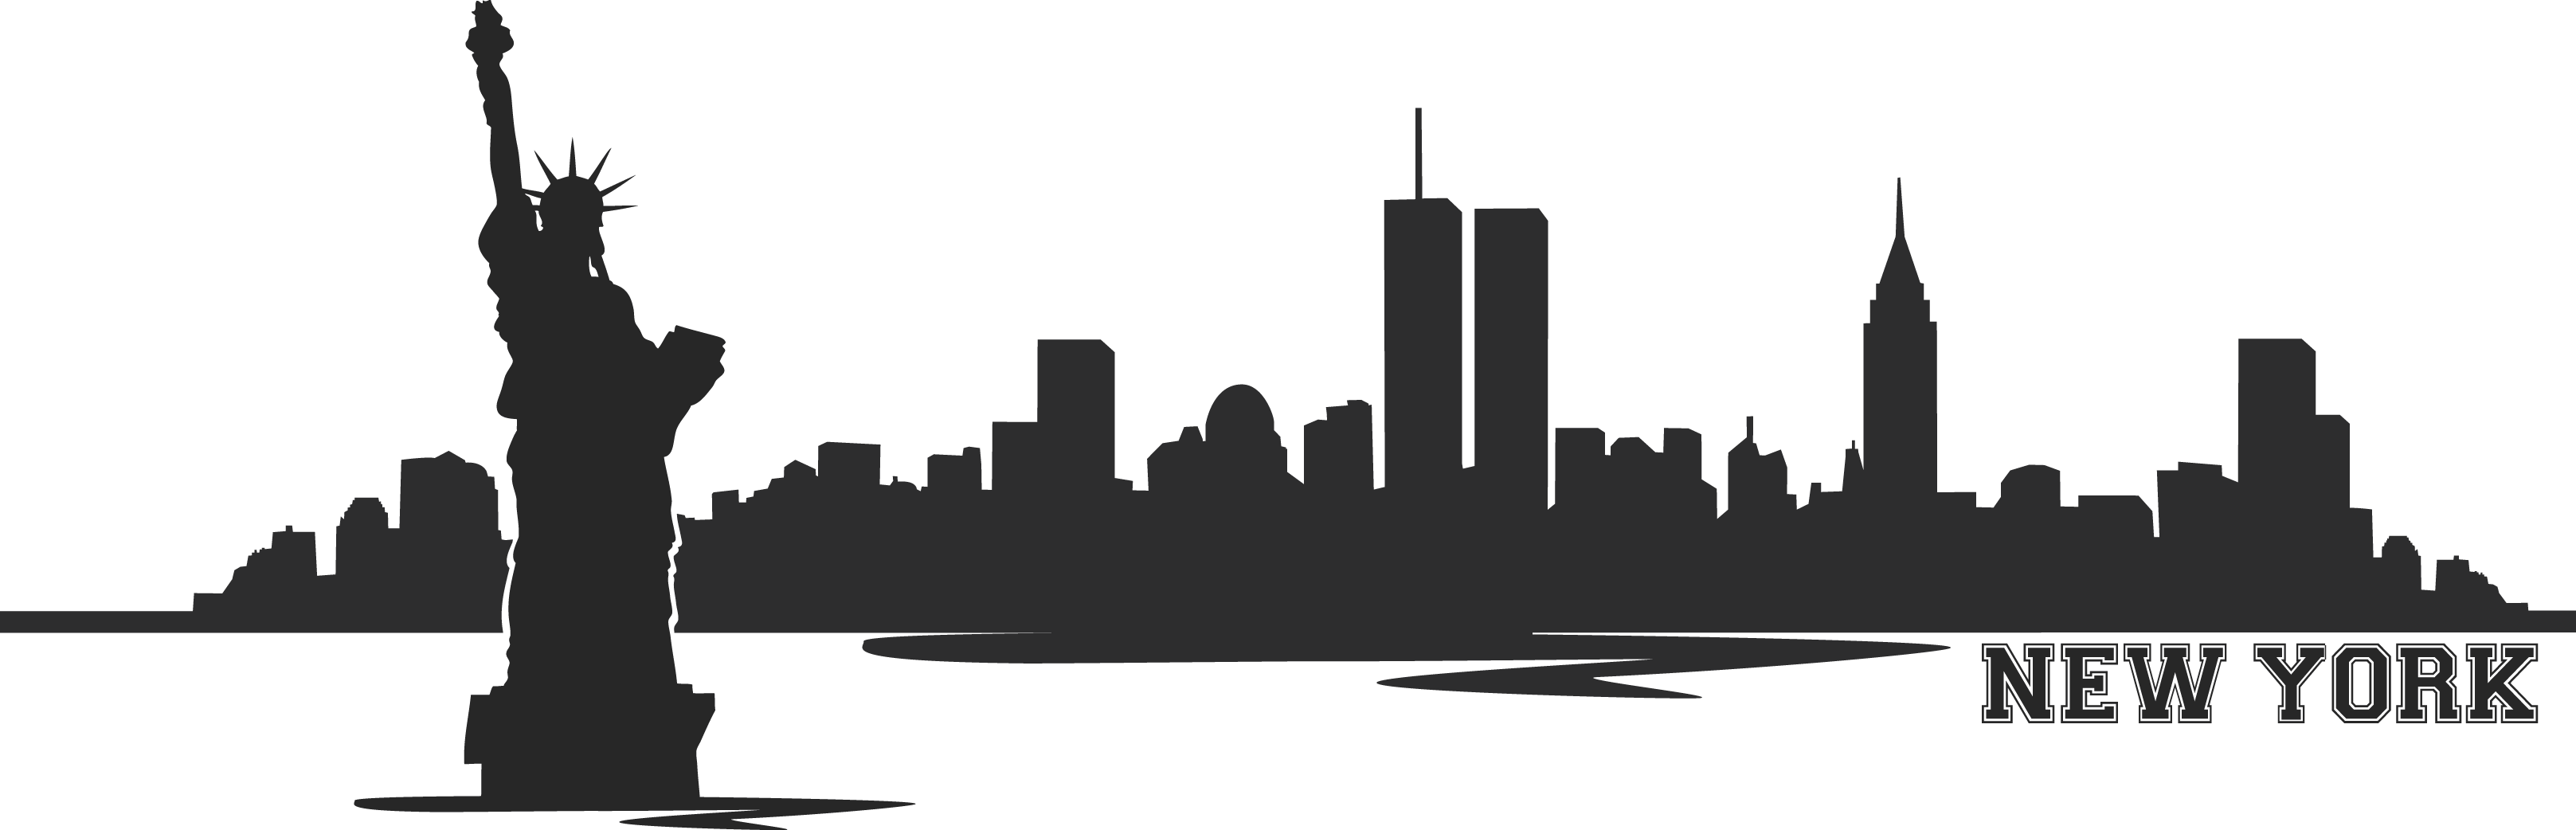 Similiar Twin Towers Manhattan Skyline Graphic Keywords.